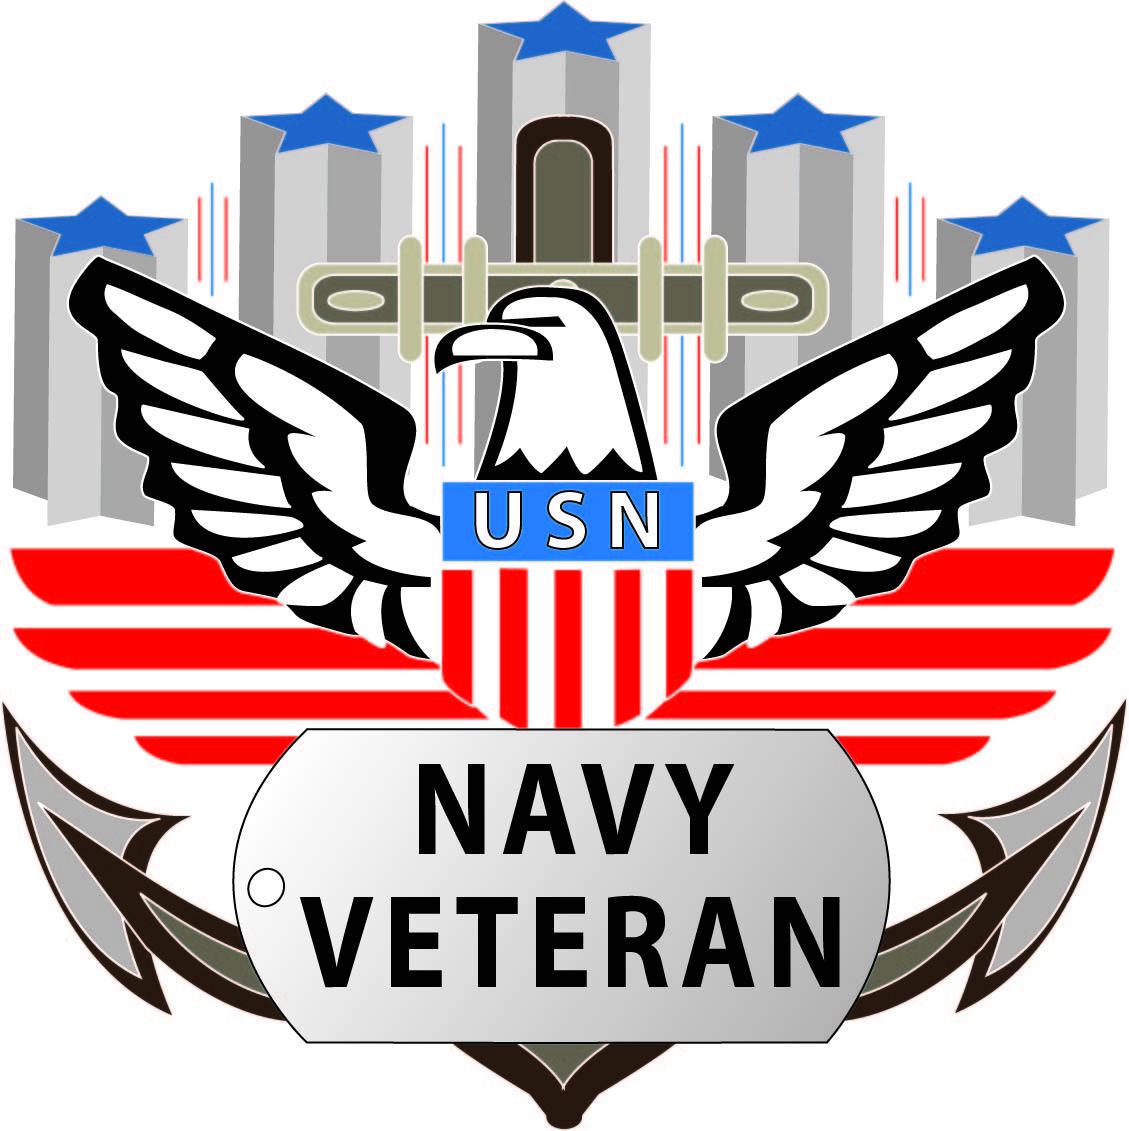 Veteran Clipart | Free download best Veteran Clipart on ...